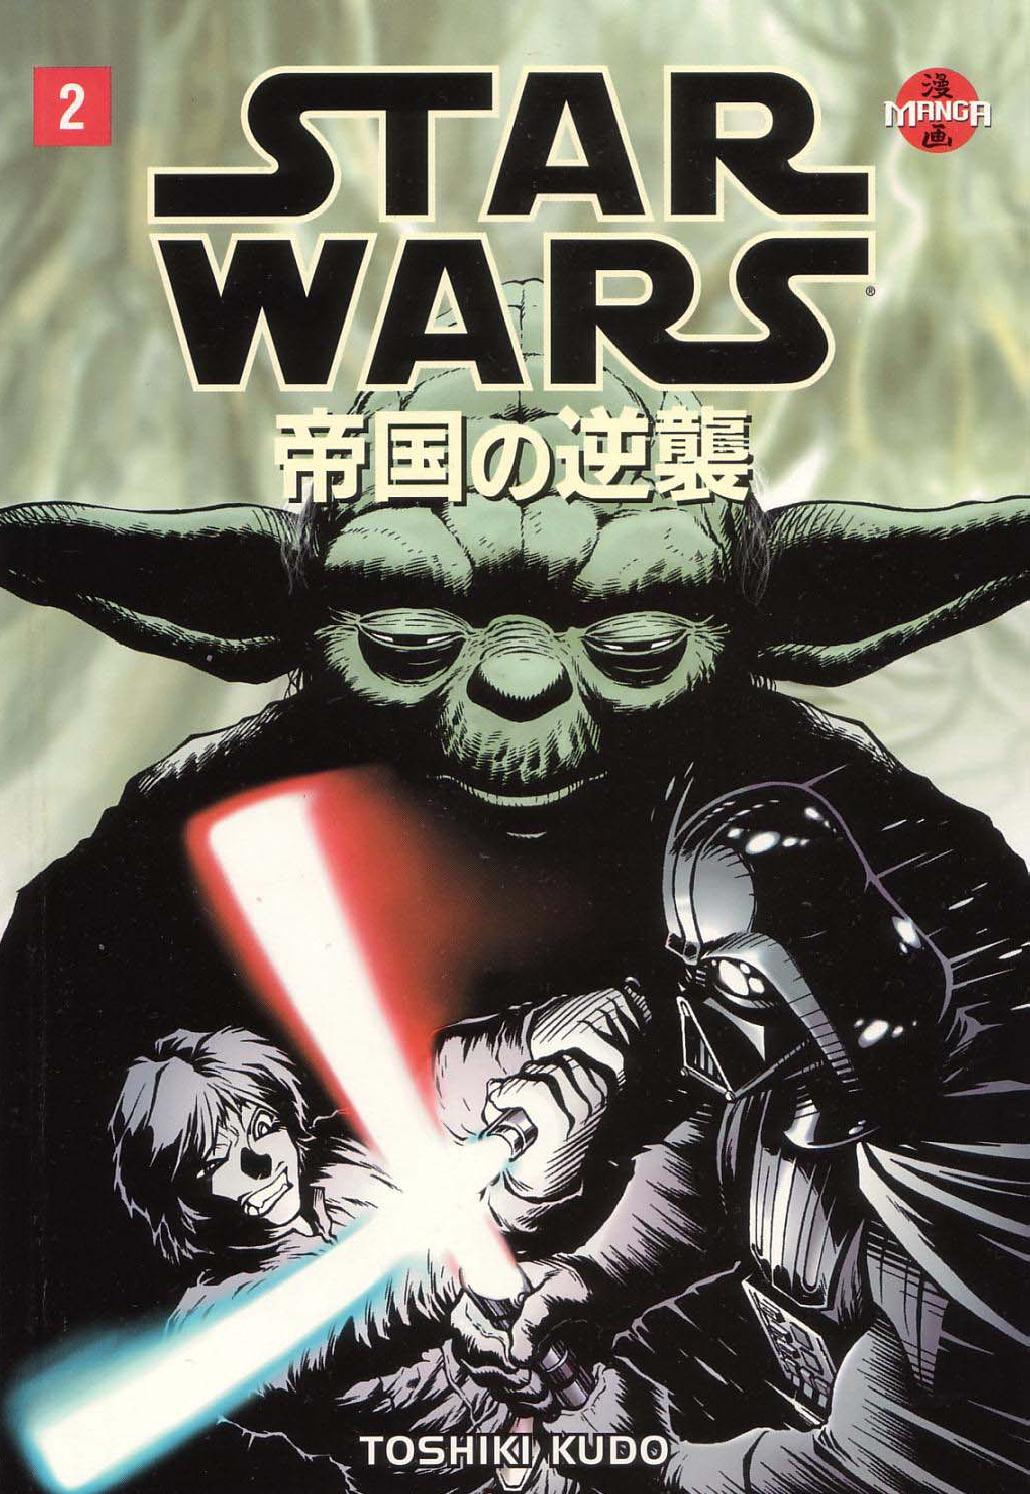 Star Wars Manga: The Empire Strikes Back - Part 2